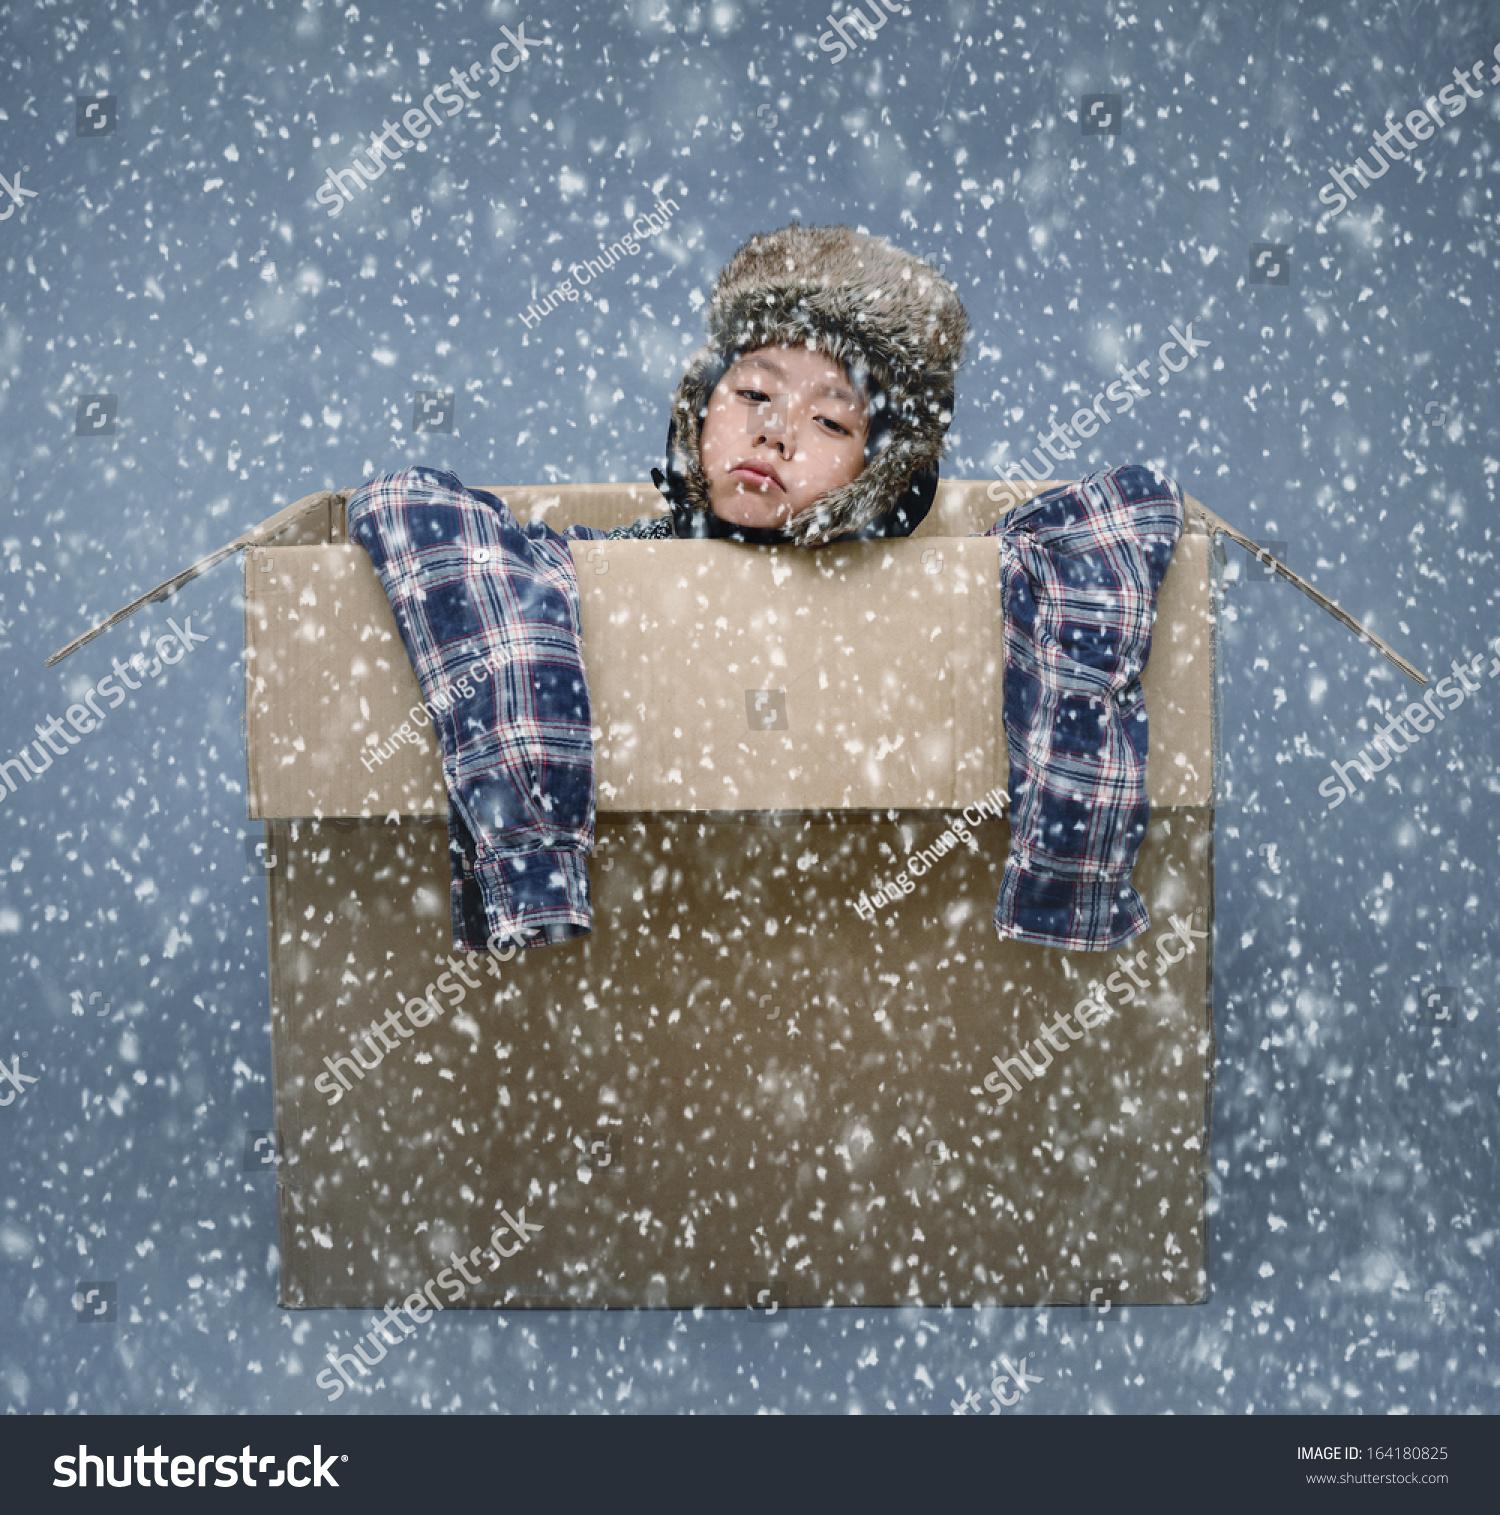 Homeless Boy Gets Bedroom For Christmas: Homeless Boy In Cardboard Box During Winter Snowfall Stock